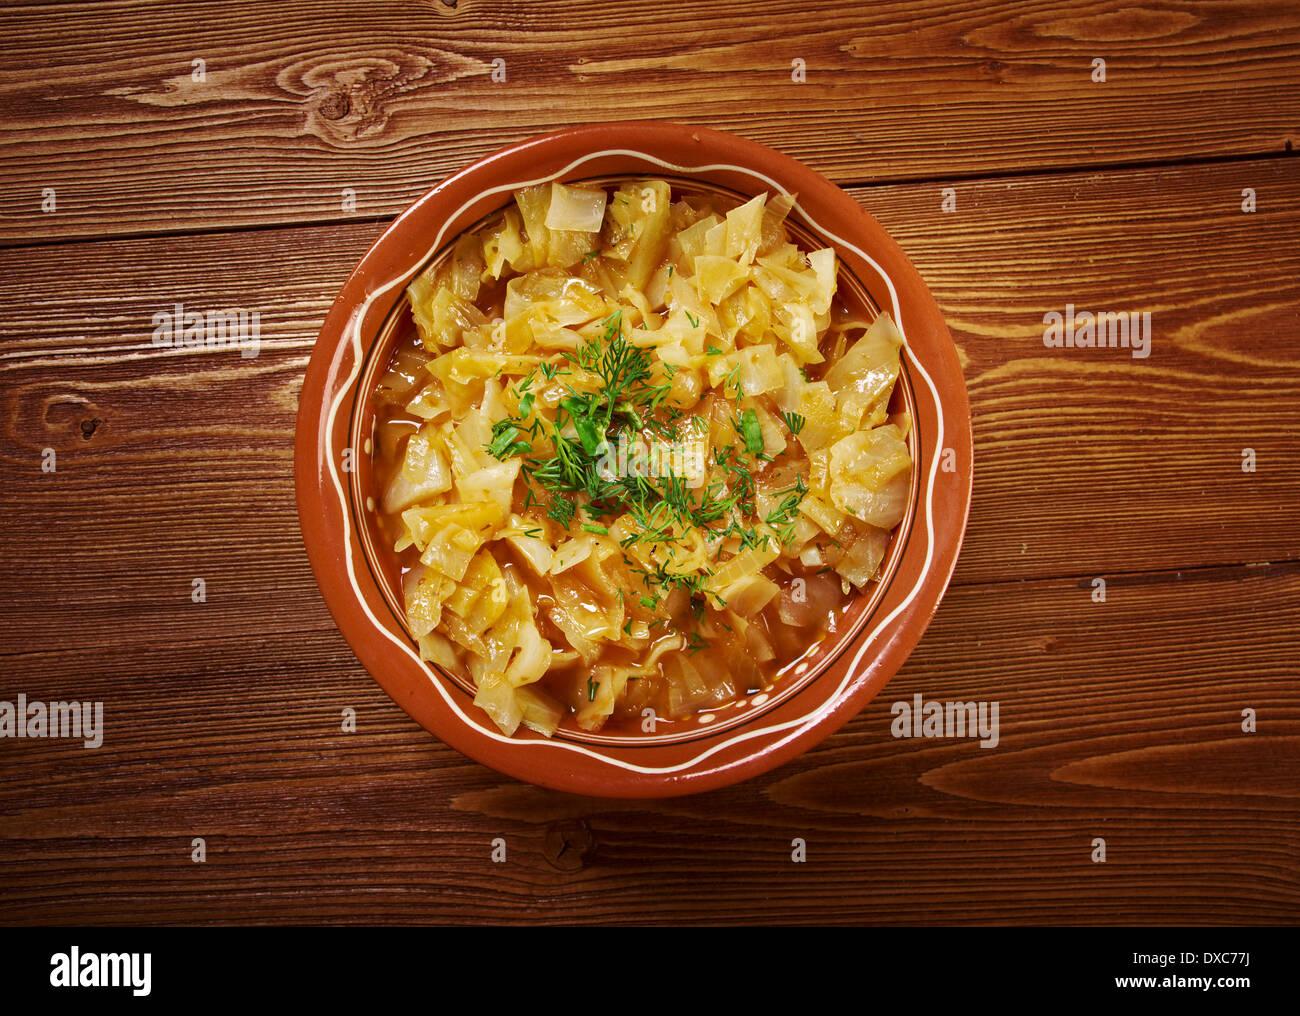 Ragoût de chou plat d'une cuisine copieuse ,.farmhouse Photo Stock